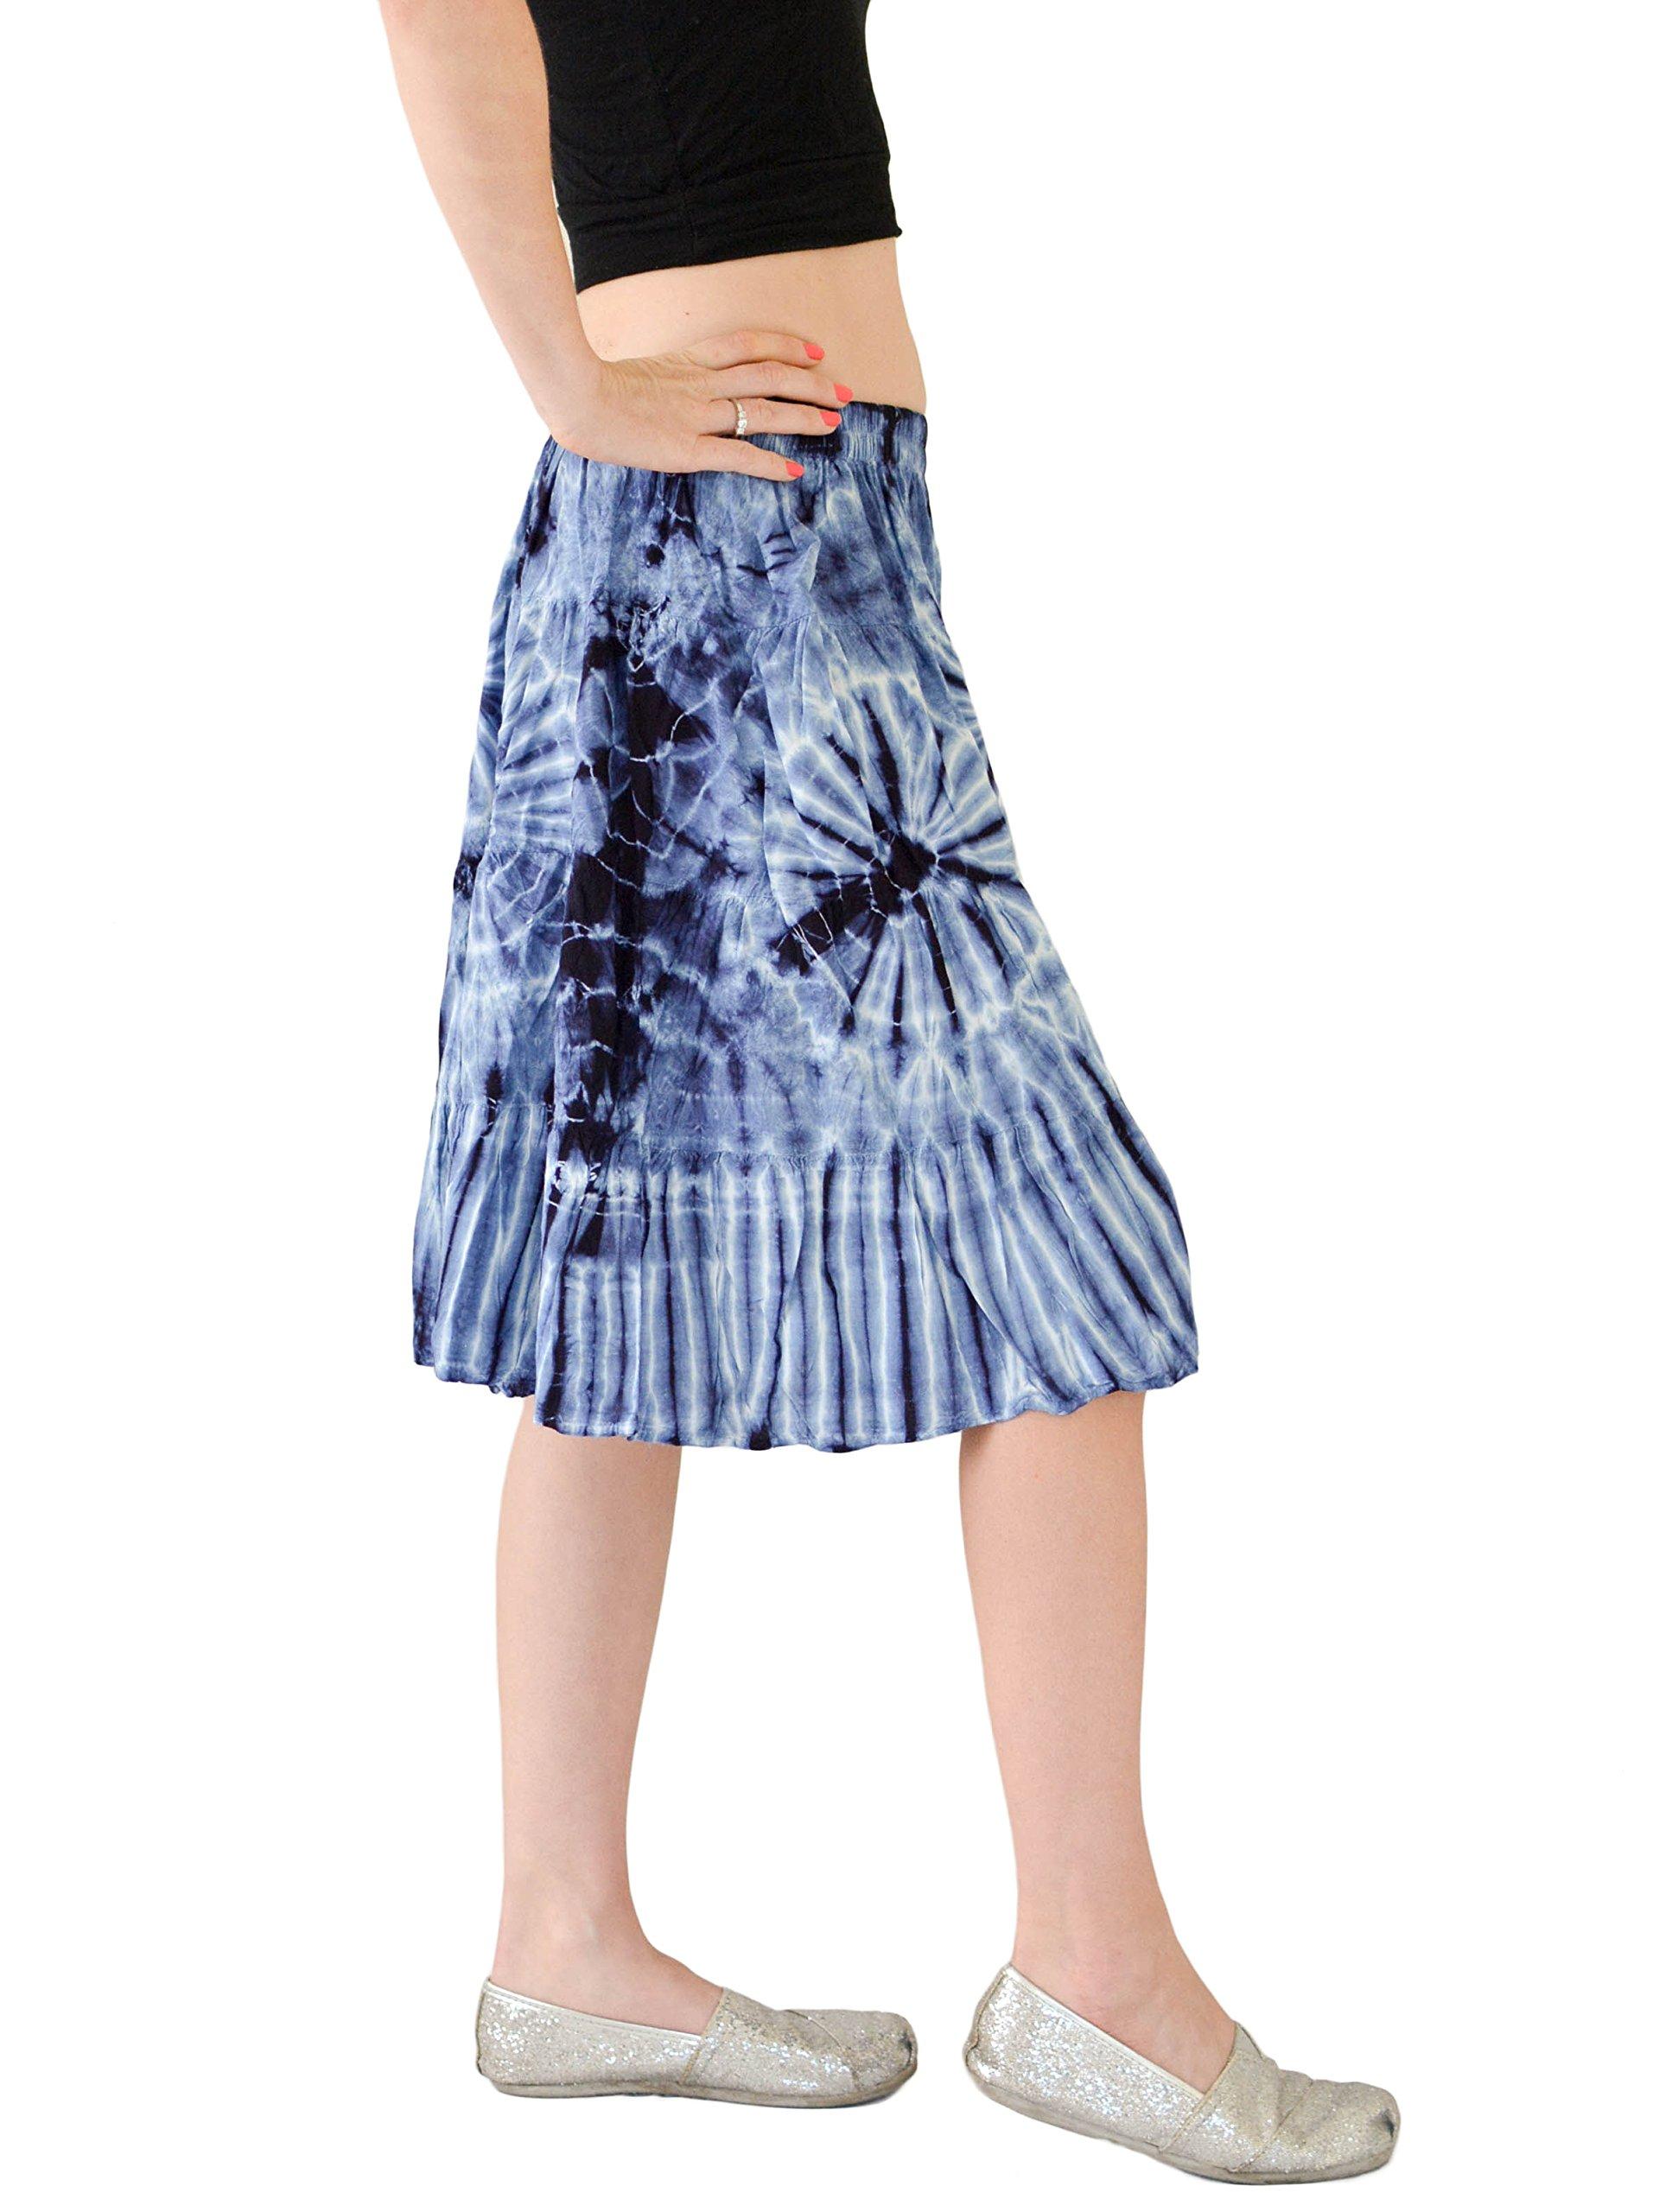 Orient Trail Women's Hippie Bohemian Boho Tie Dye Knee Length Mini Skirt M/L Dark Shibori Blue by Orient Trail (Image #3)